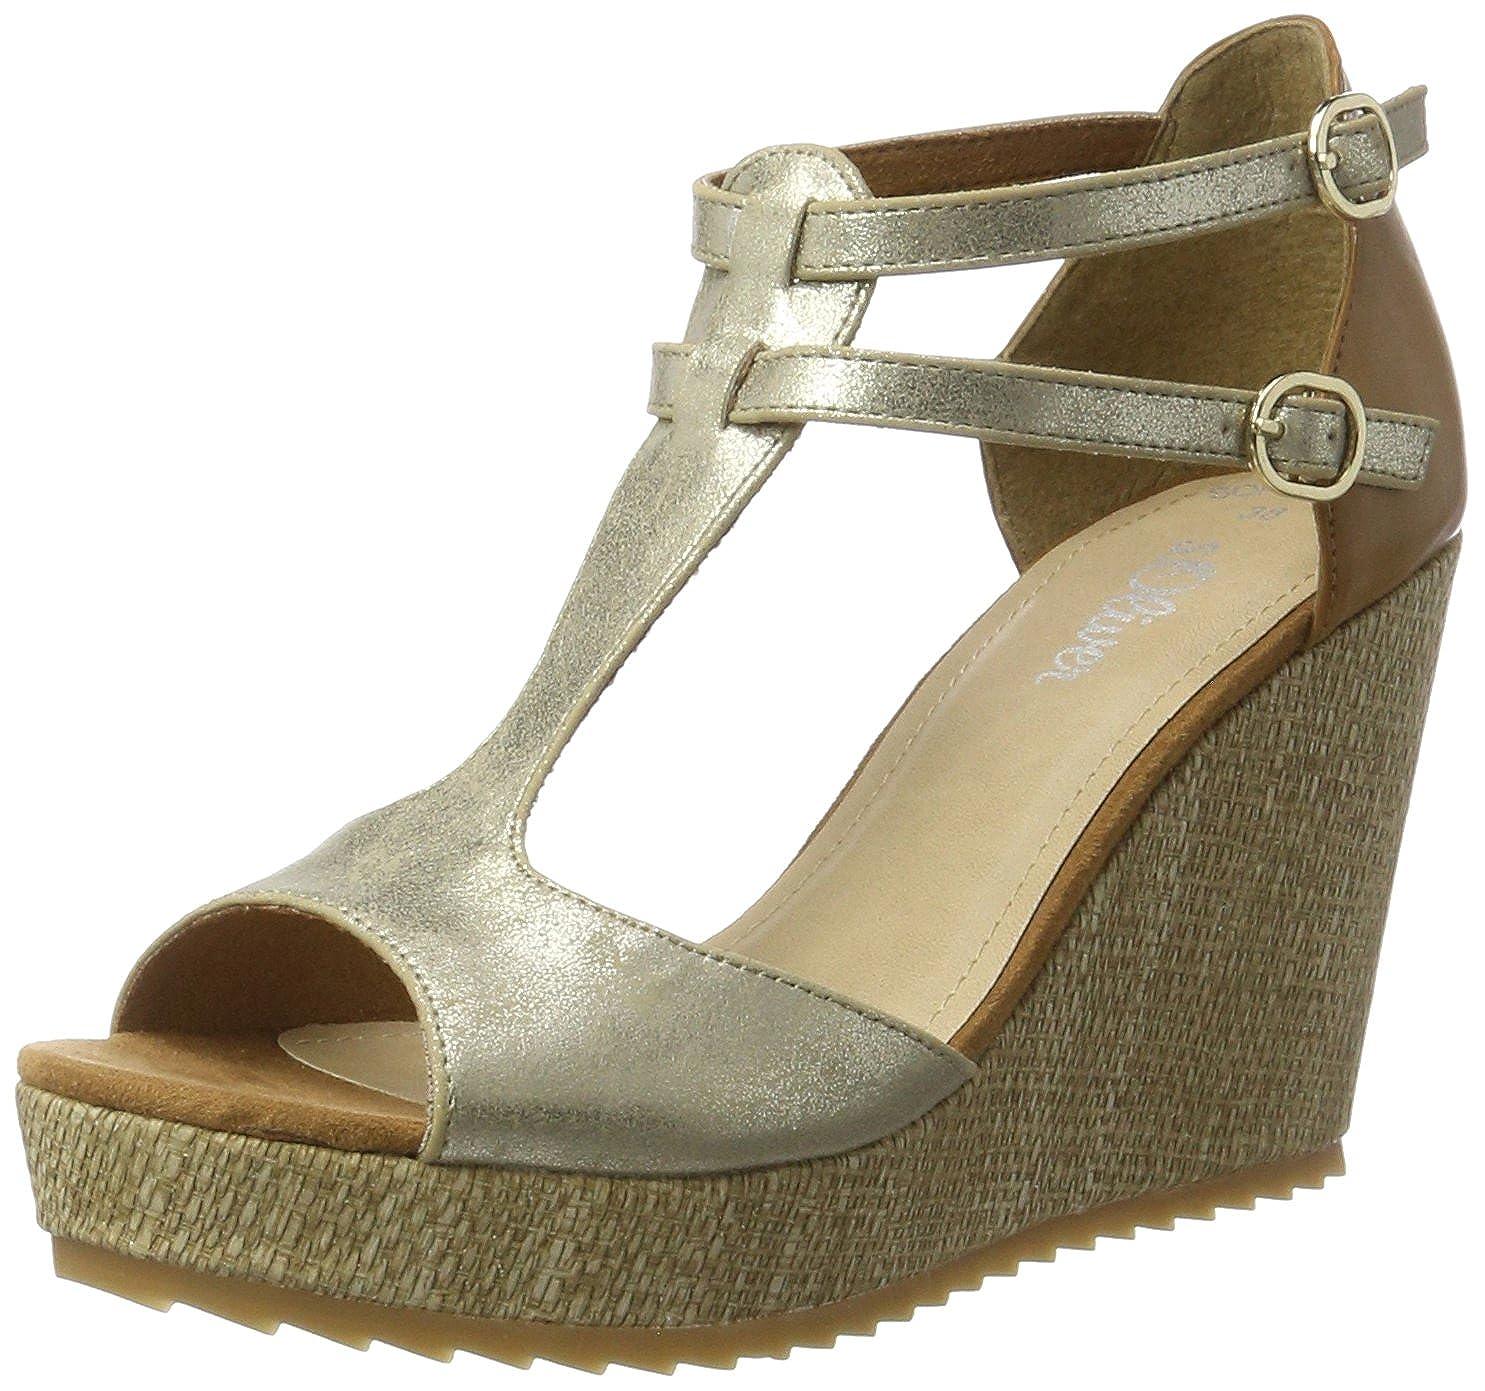 reputable site e03fd ceffe Amazon.com: s.Oliver Da.-Sandalette Size 9.5 US Silver: Shoes